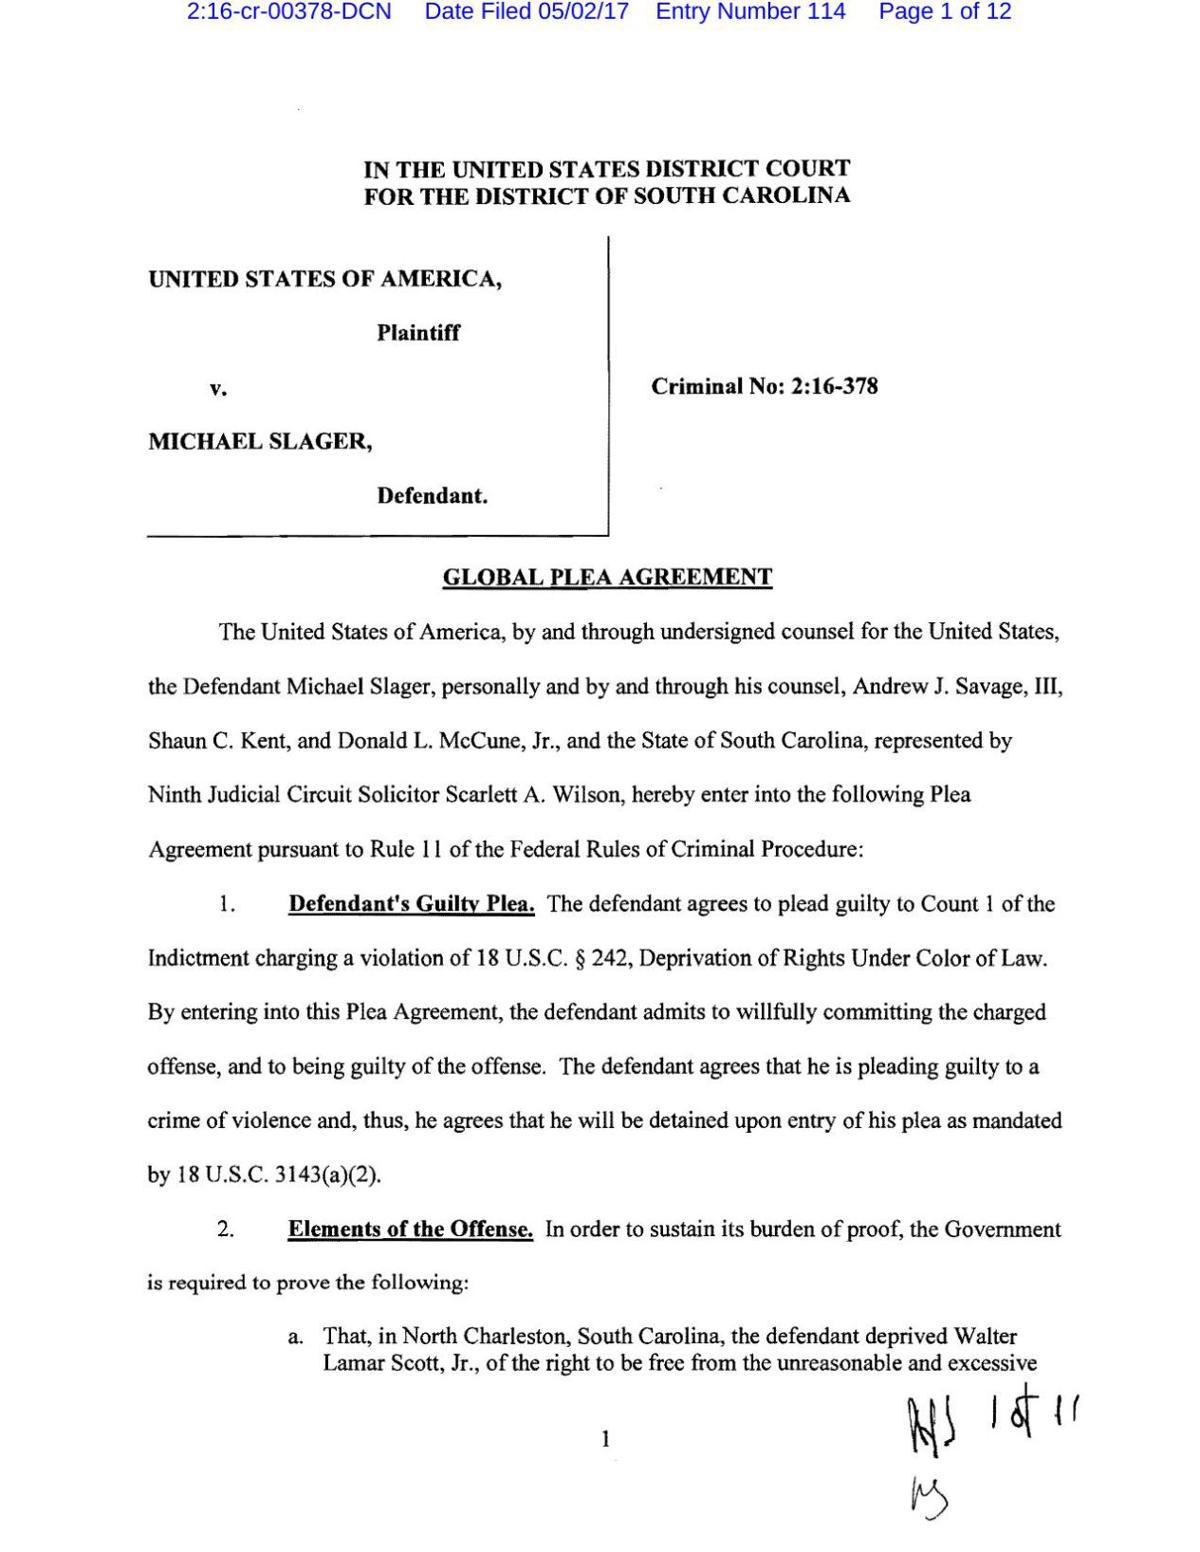 Slager plea agreement